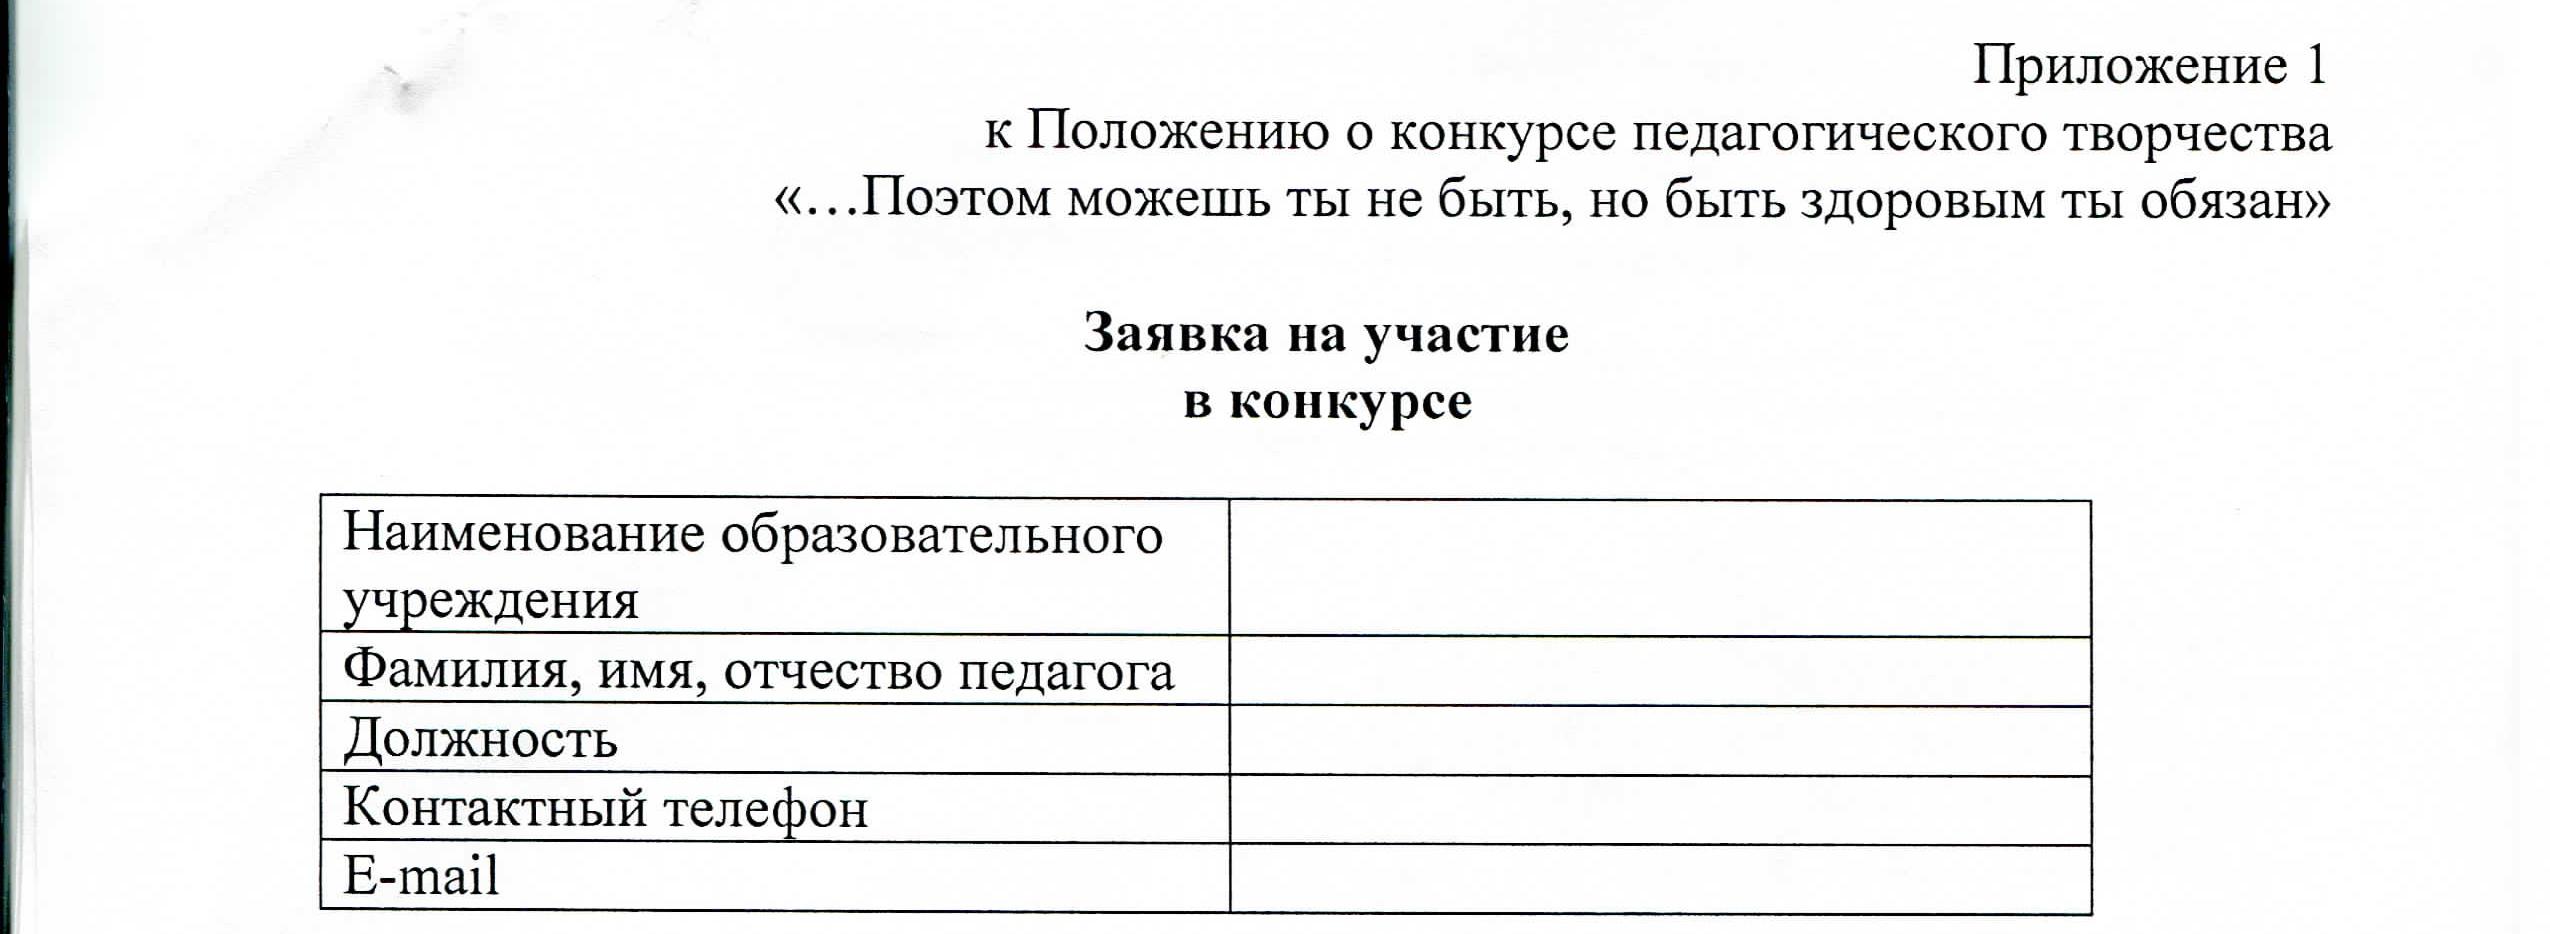 konk ped tvor_Страница_3